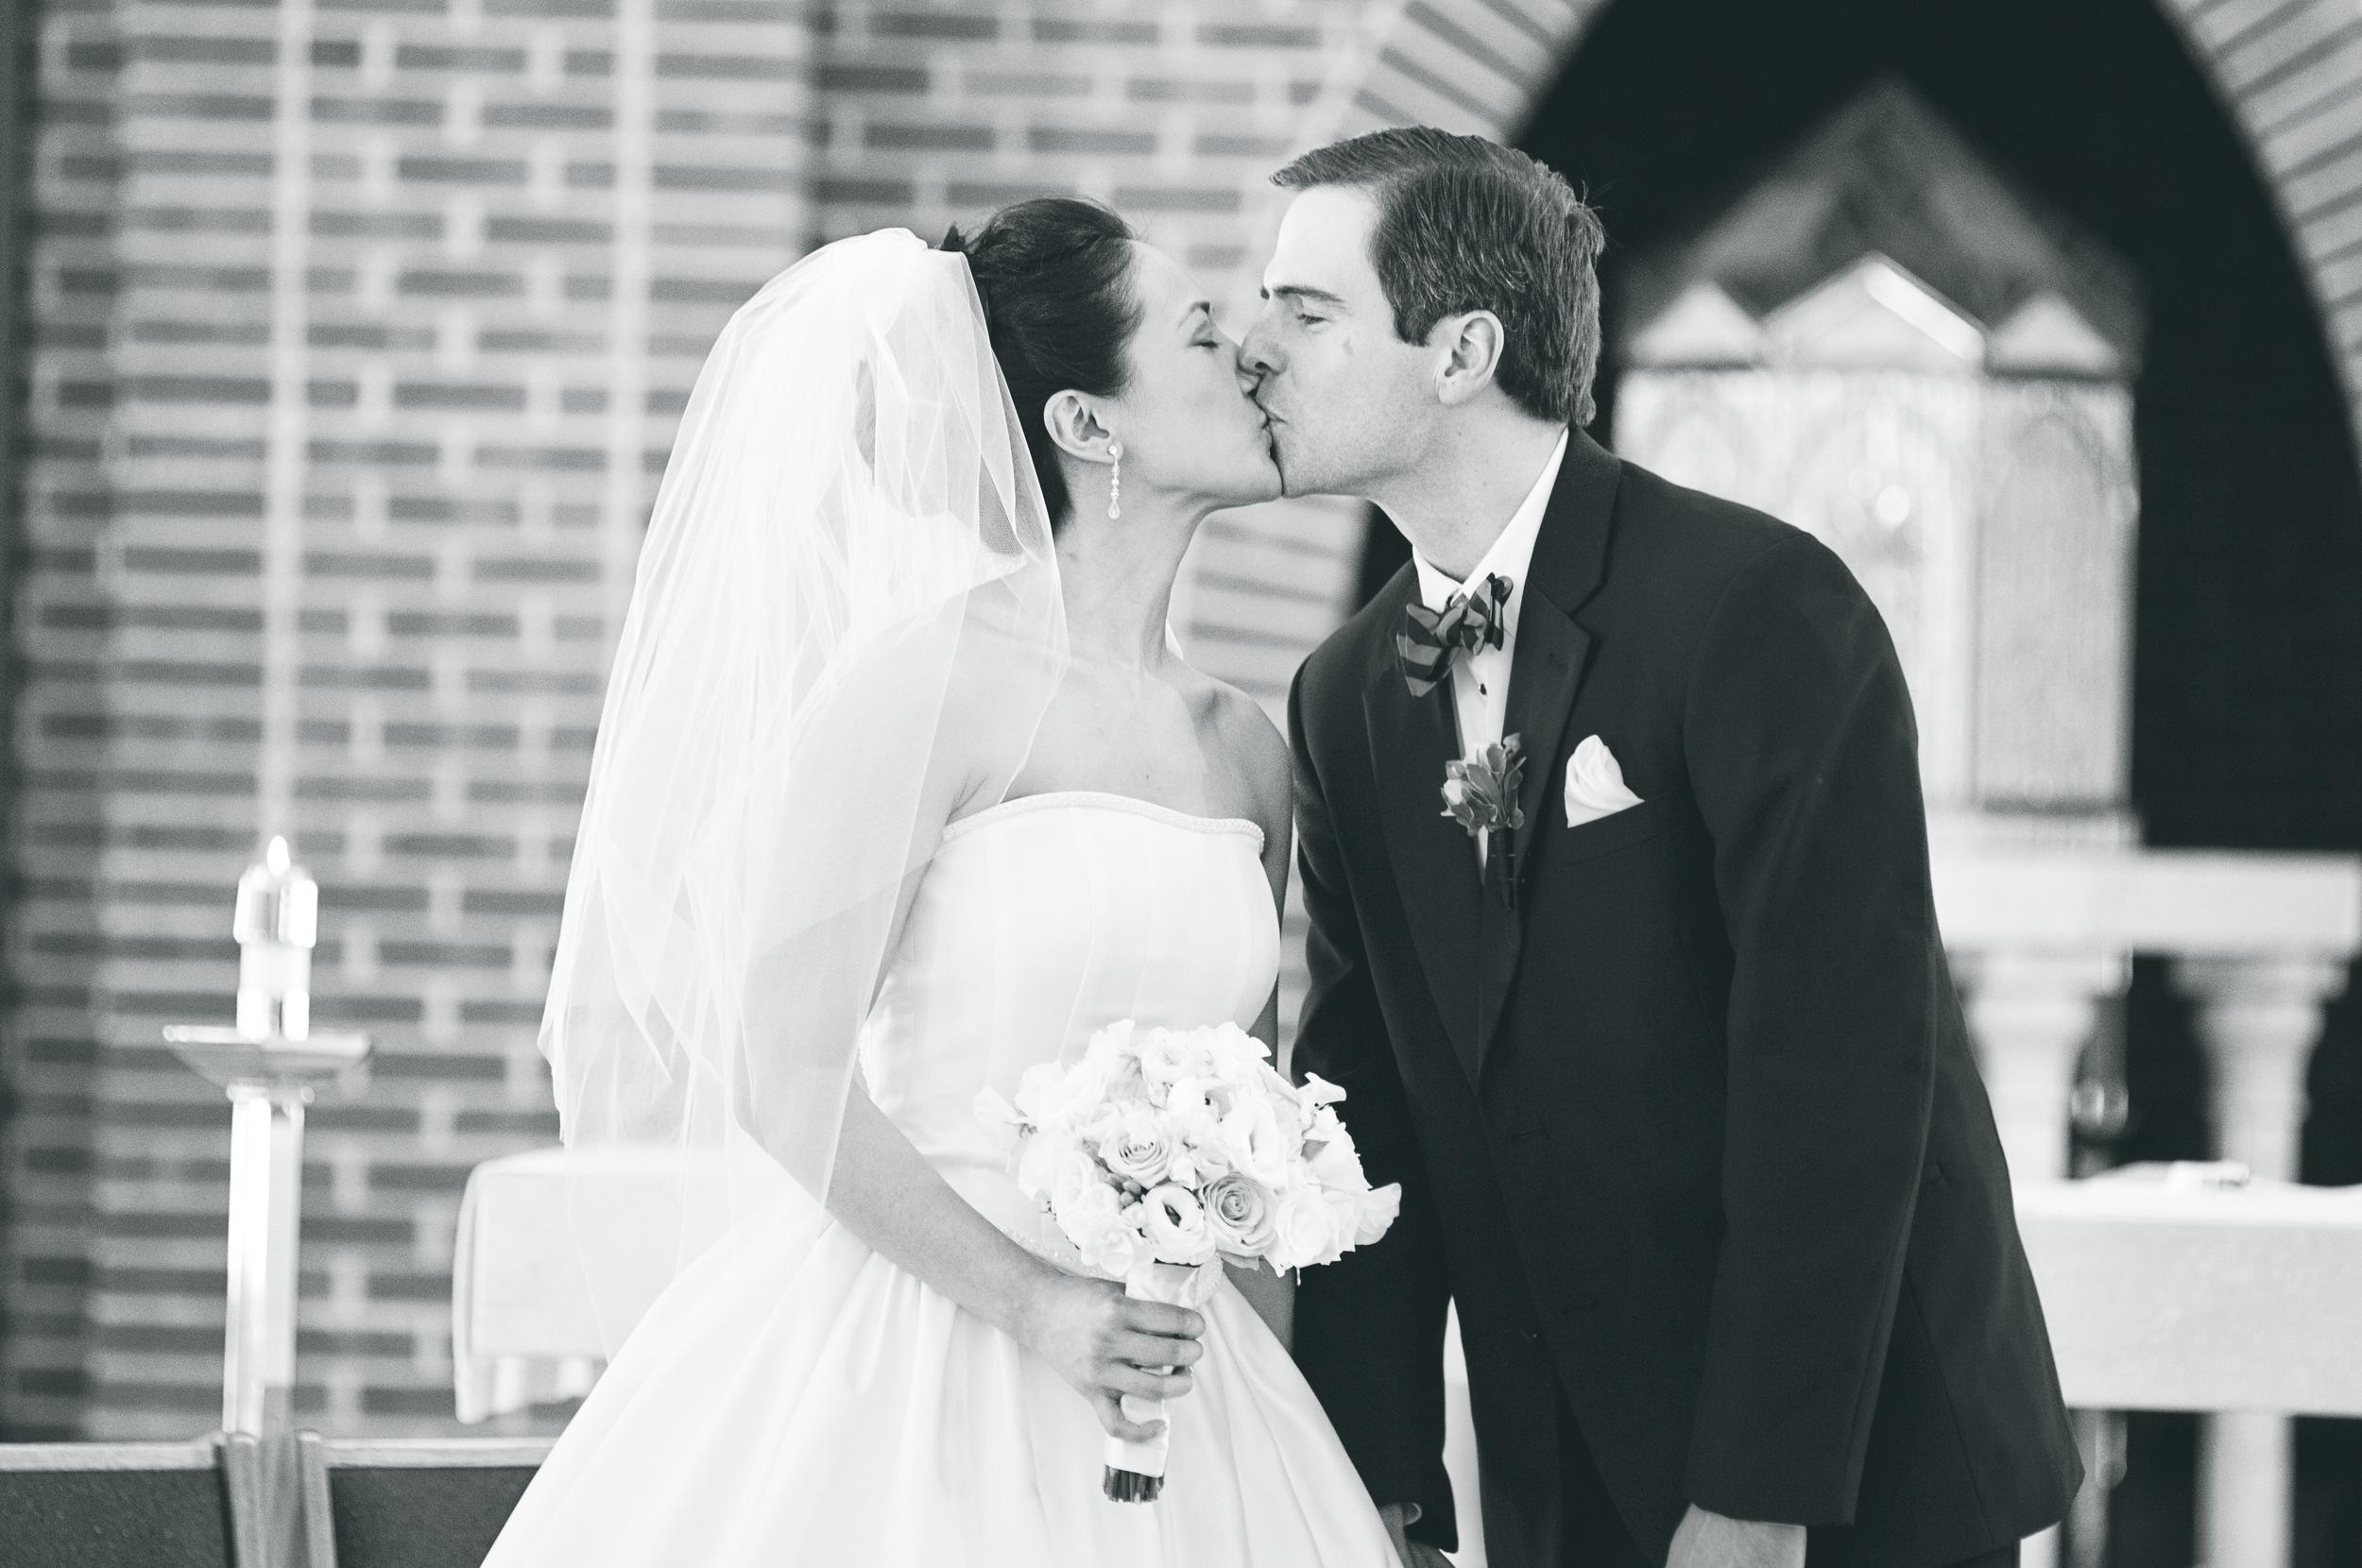 Angela_Chicoski_CT_wedding_photographer_050.jpg